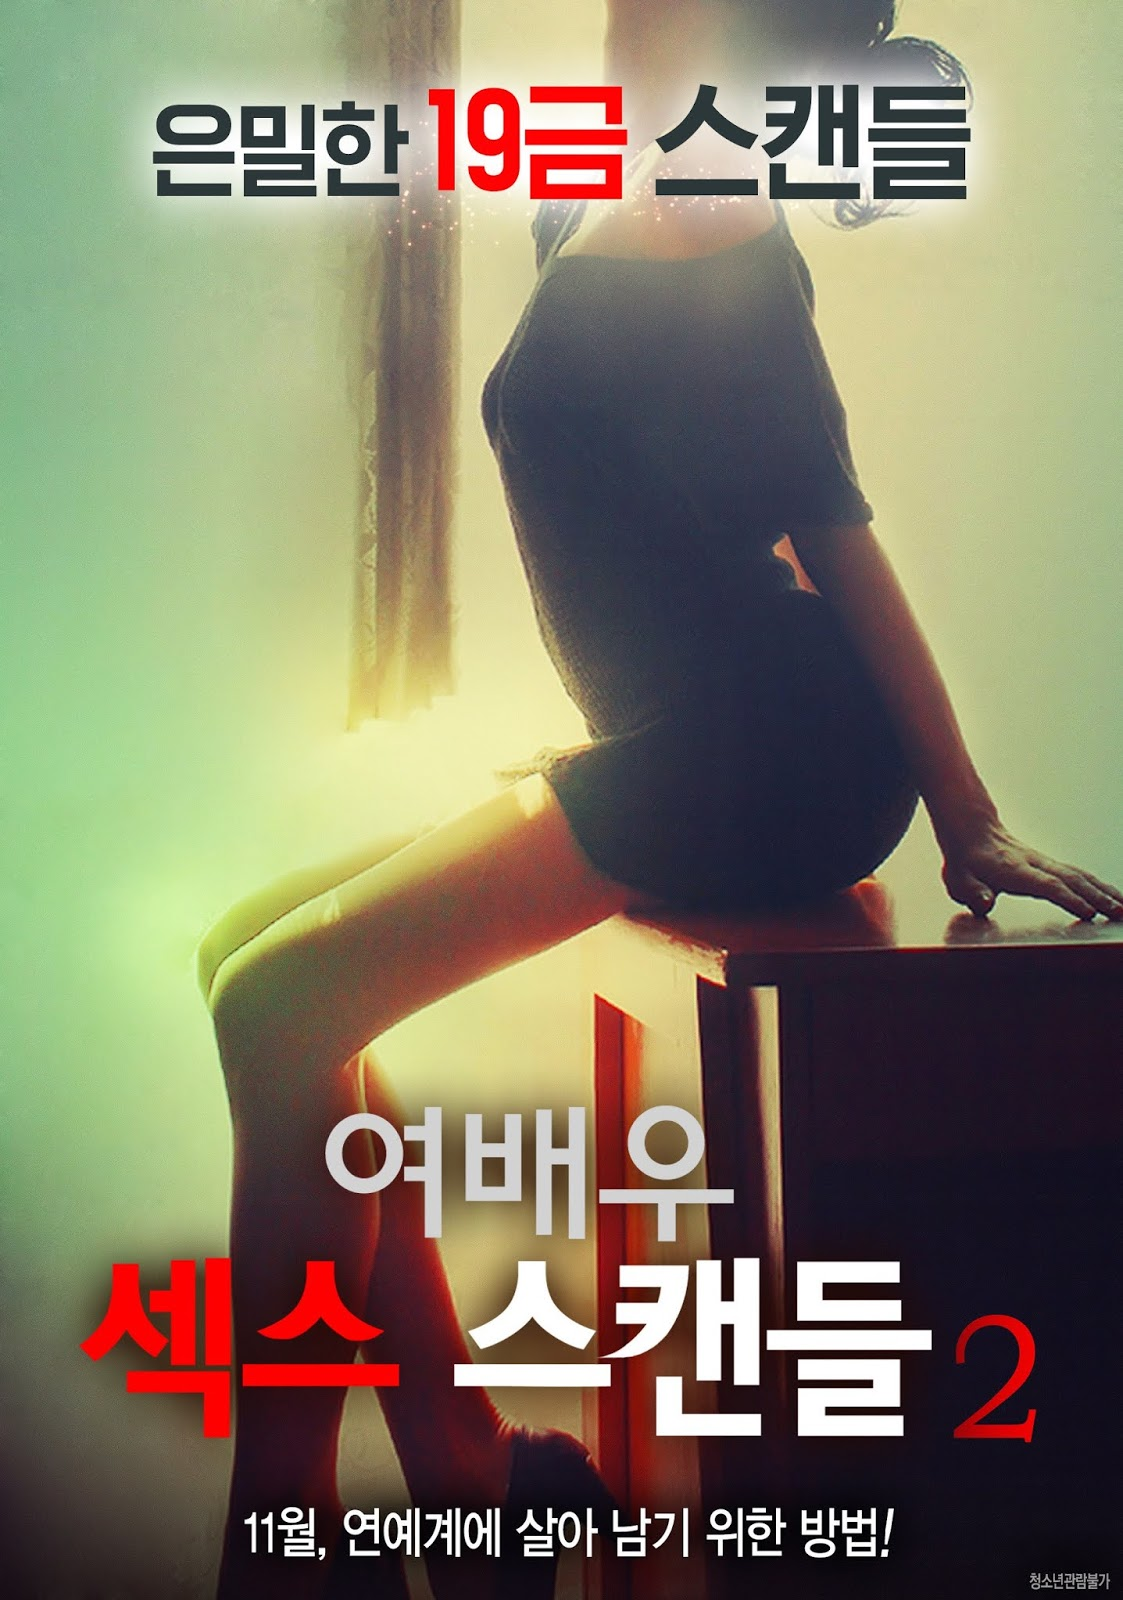 Actress Sex Scandal 2 Full Korea 18+ Adult Movie Online Free